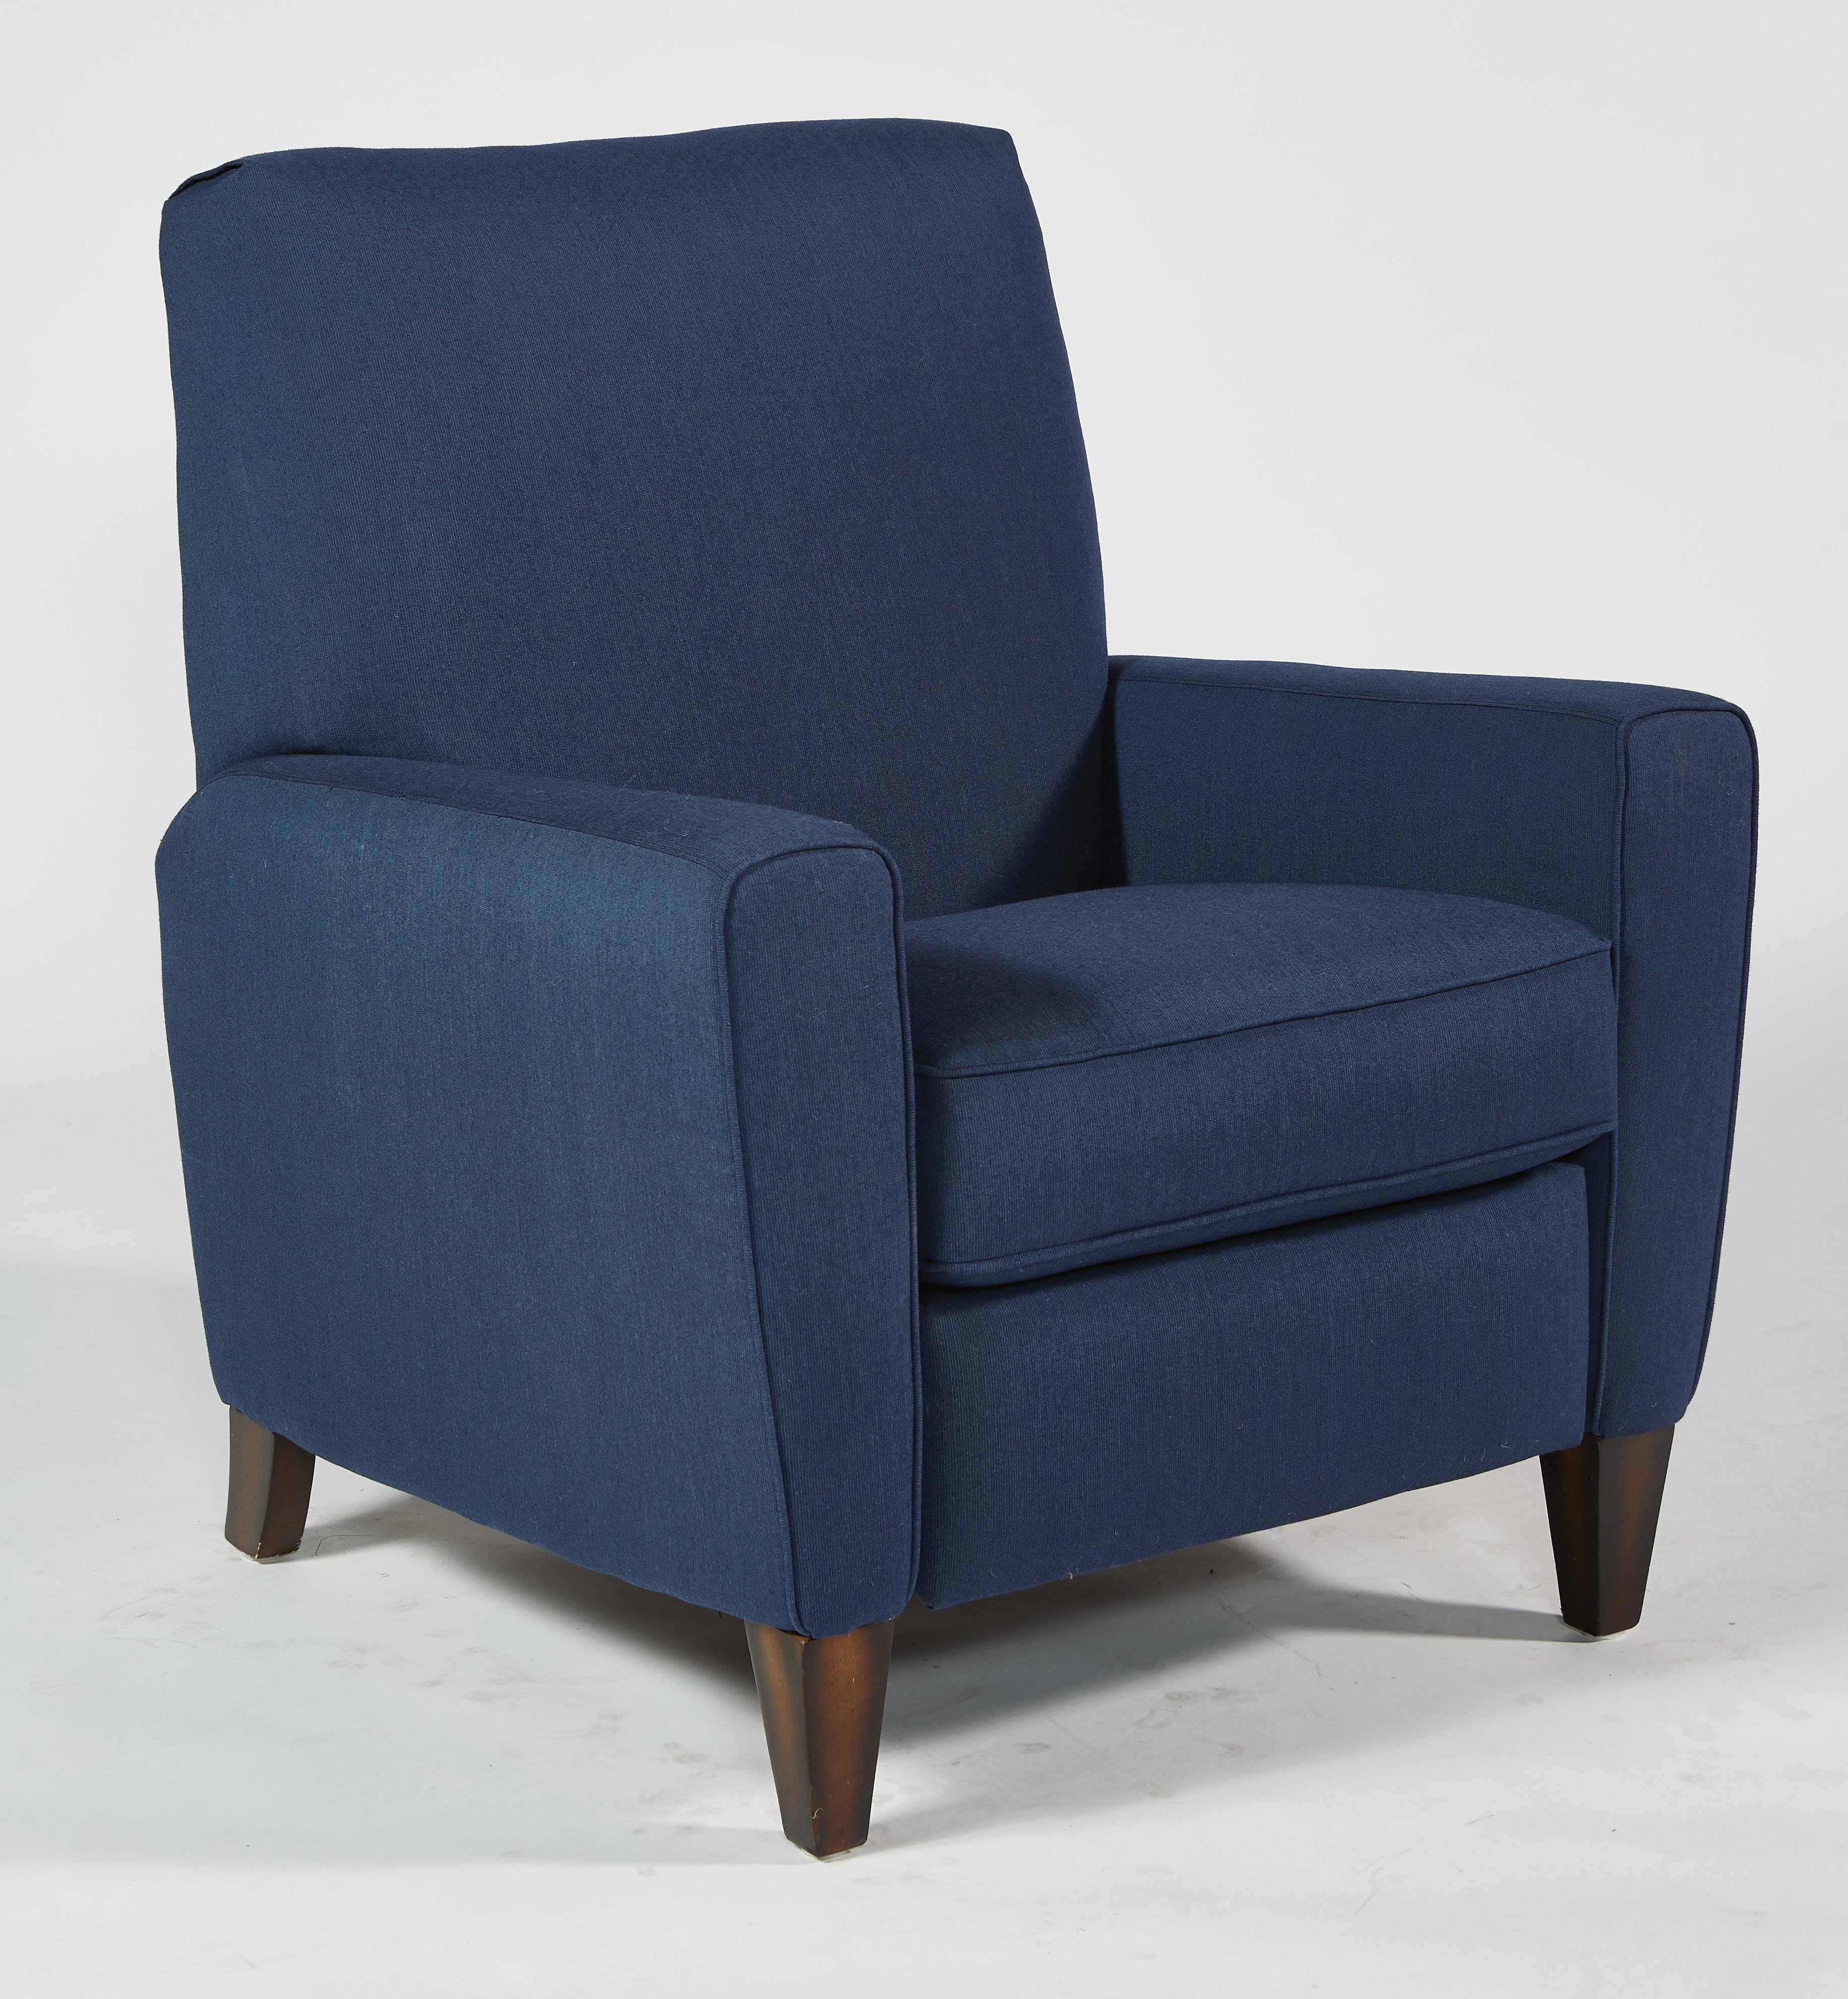 Digby High Leg Recliner by Flexsteel at Suburban Furniture